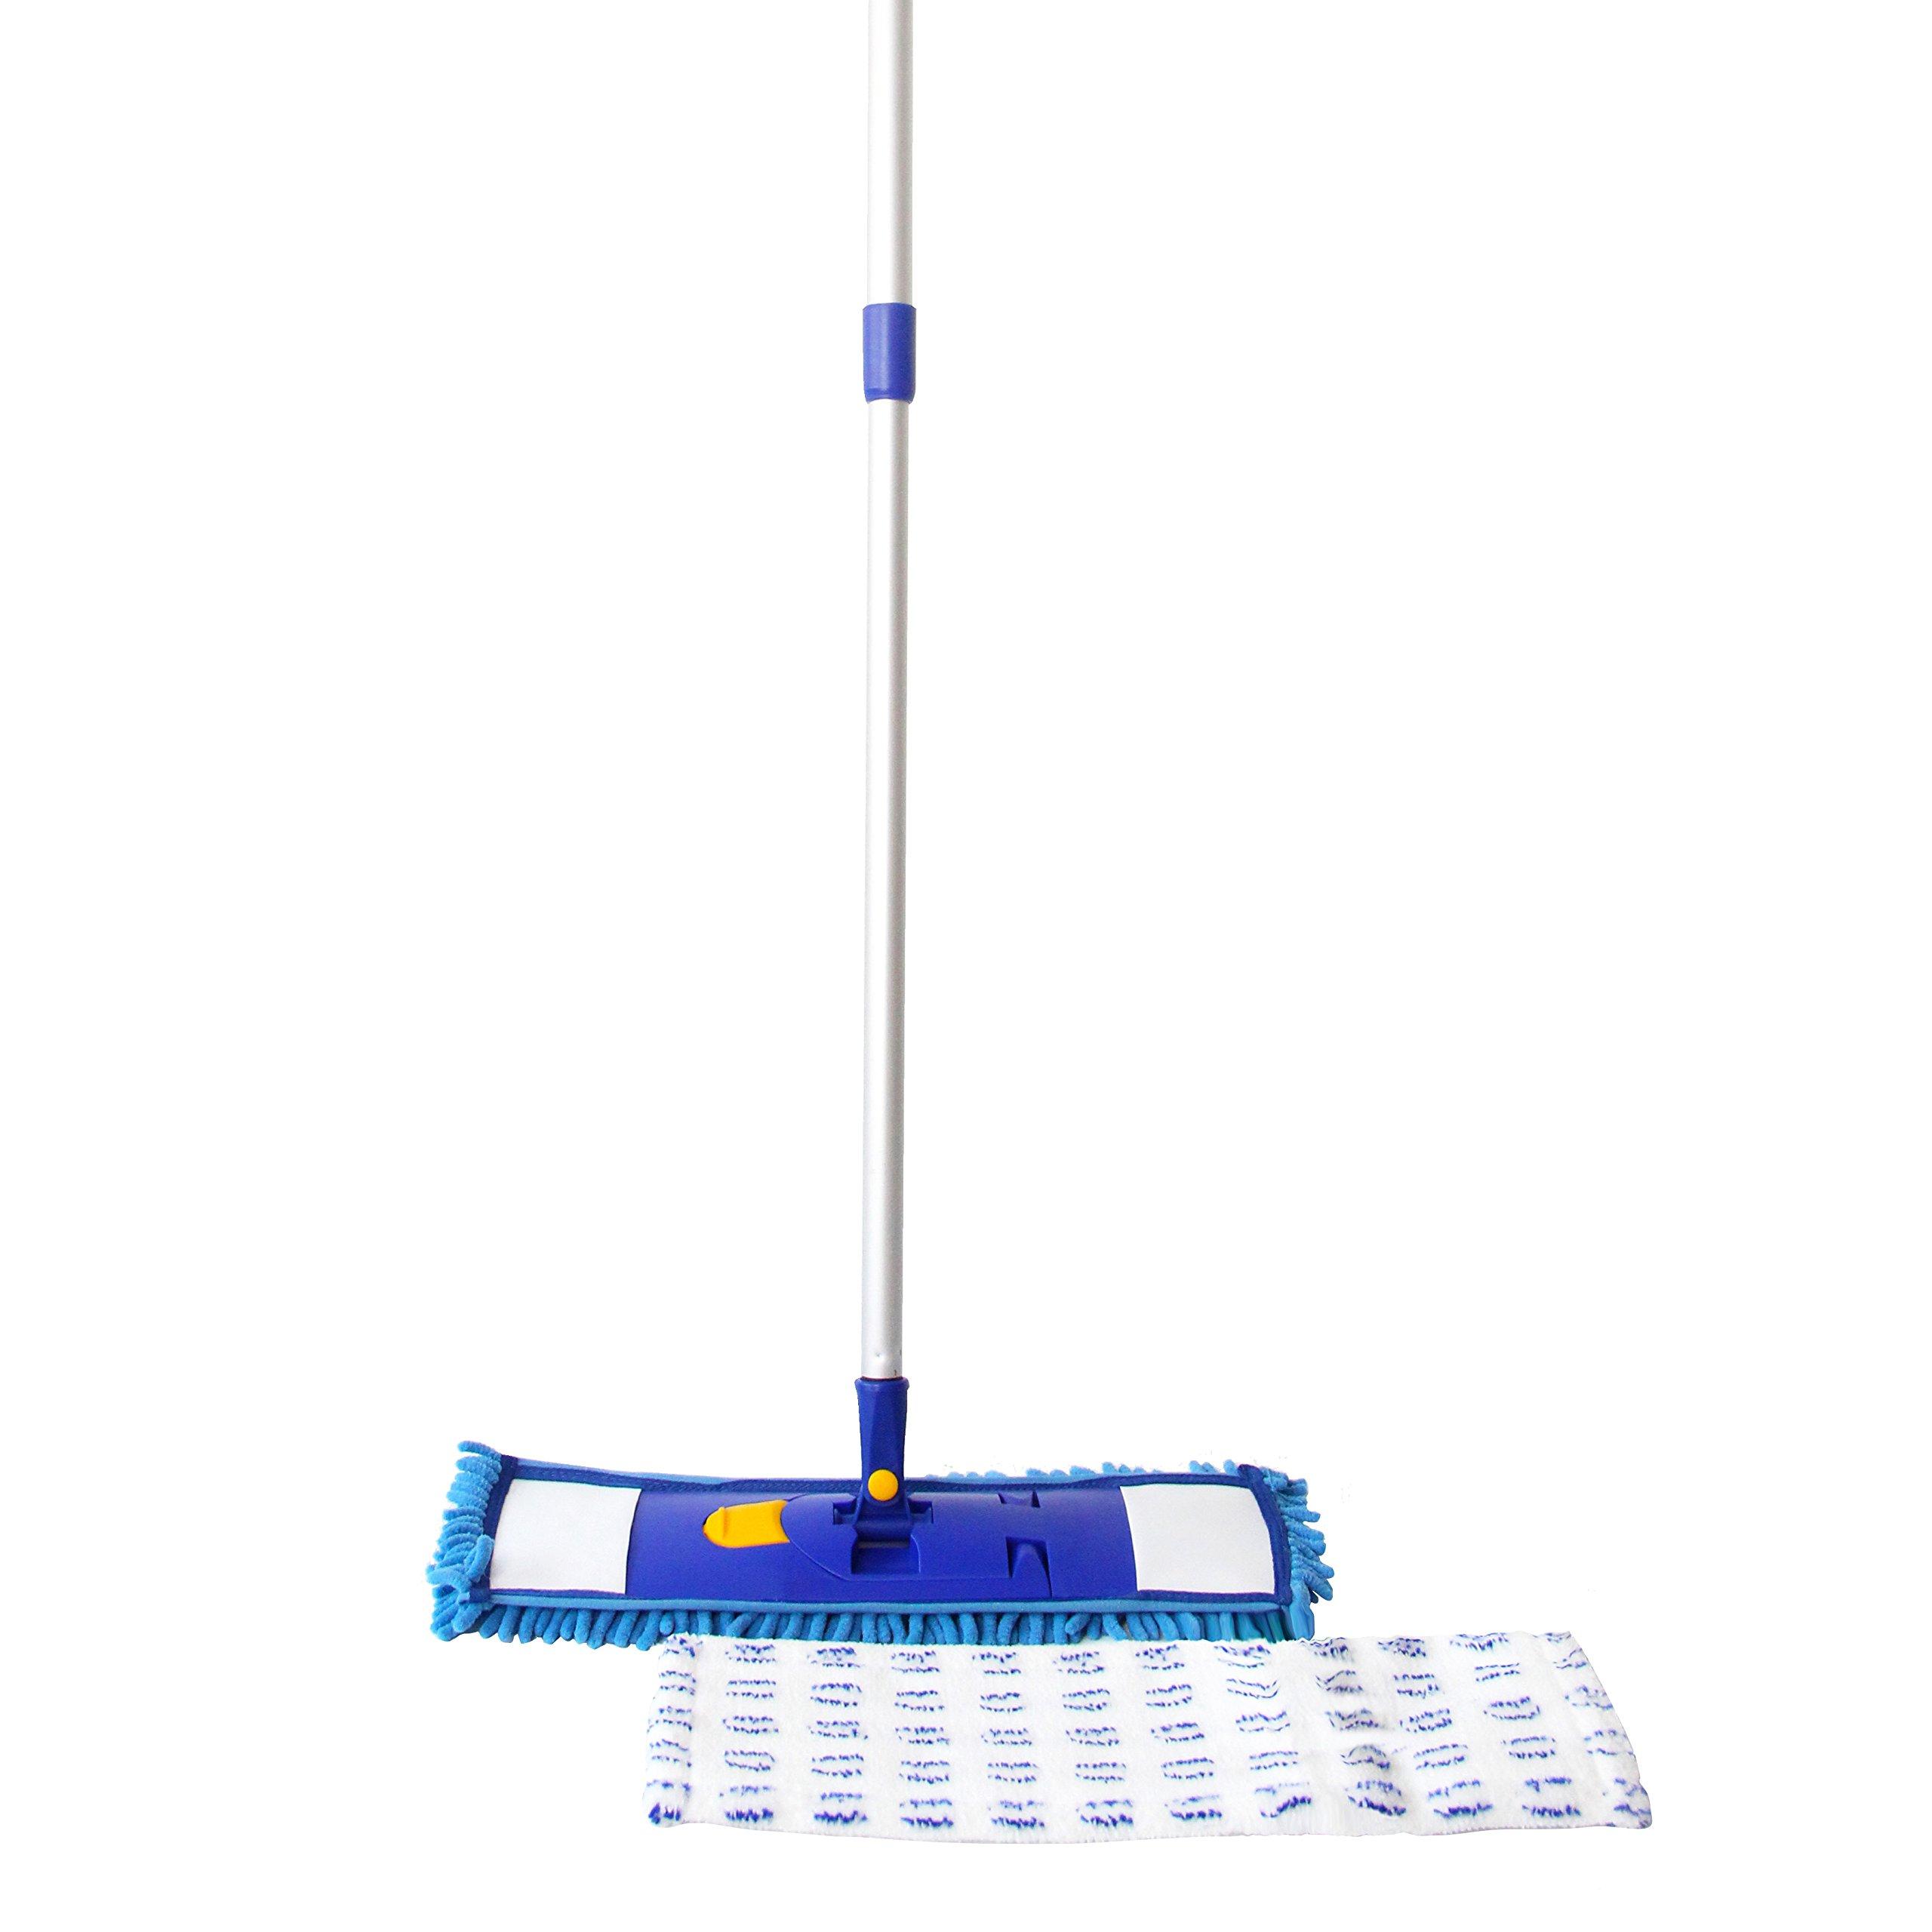 MING DA Professional Microfiber Mop for hardwood,tile ,laminate,High-intensity Aluminum Handle,Best all in 1 kit Dry & wet cleaning+2 Free Microfiber Cloth Refills